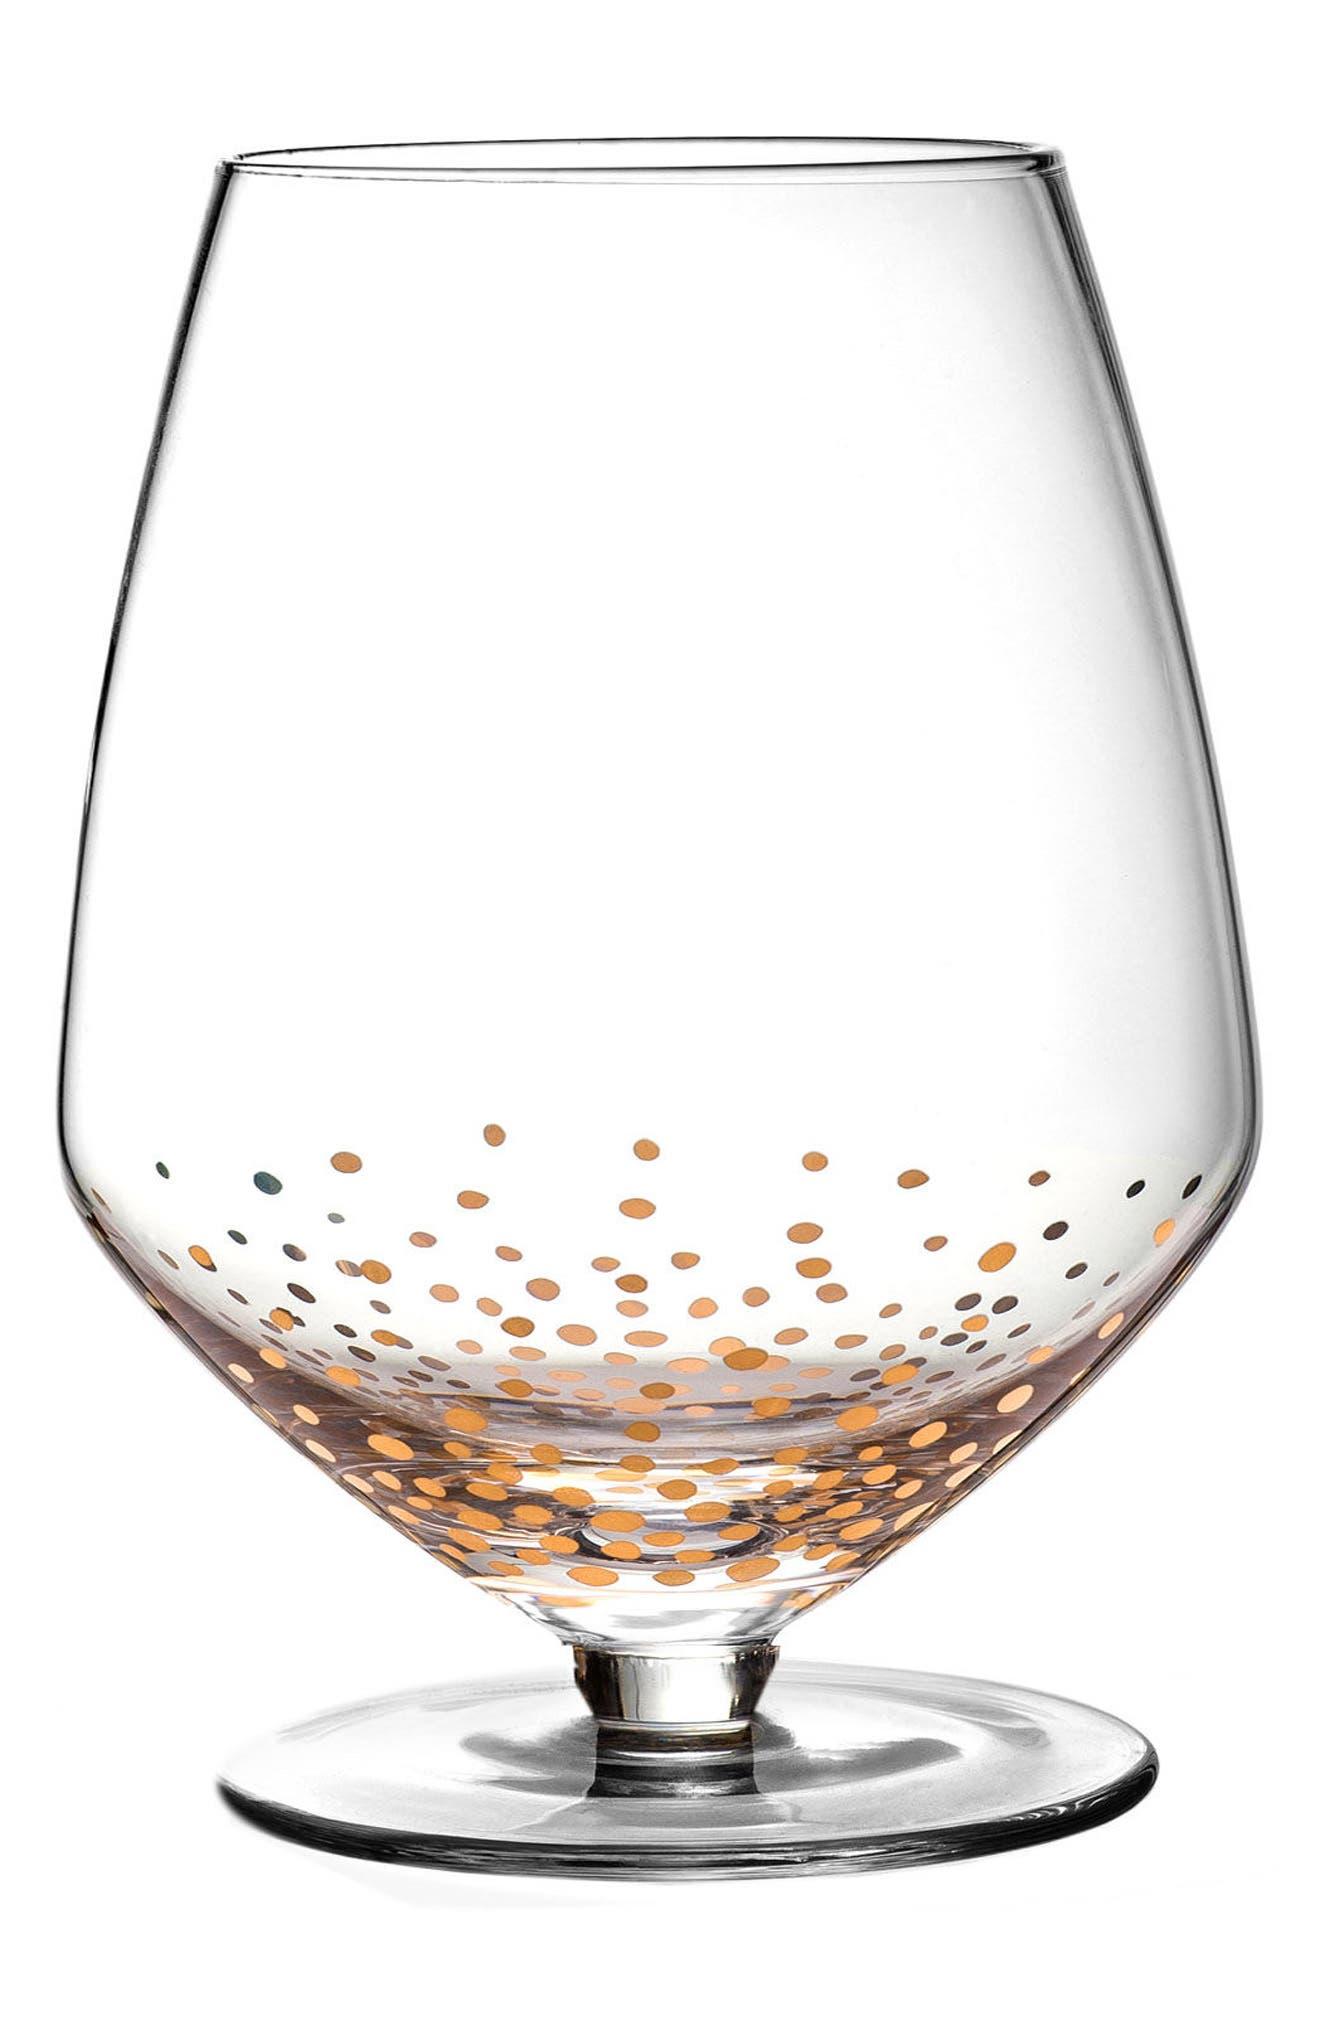 American Atelier Luster Set of 4 Pinot Noir Wine Glasses